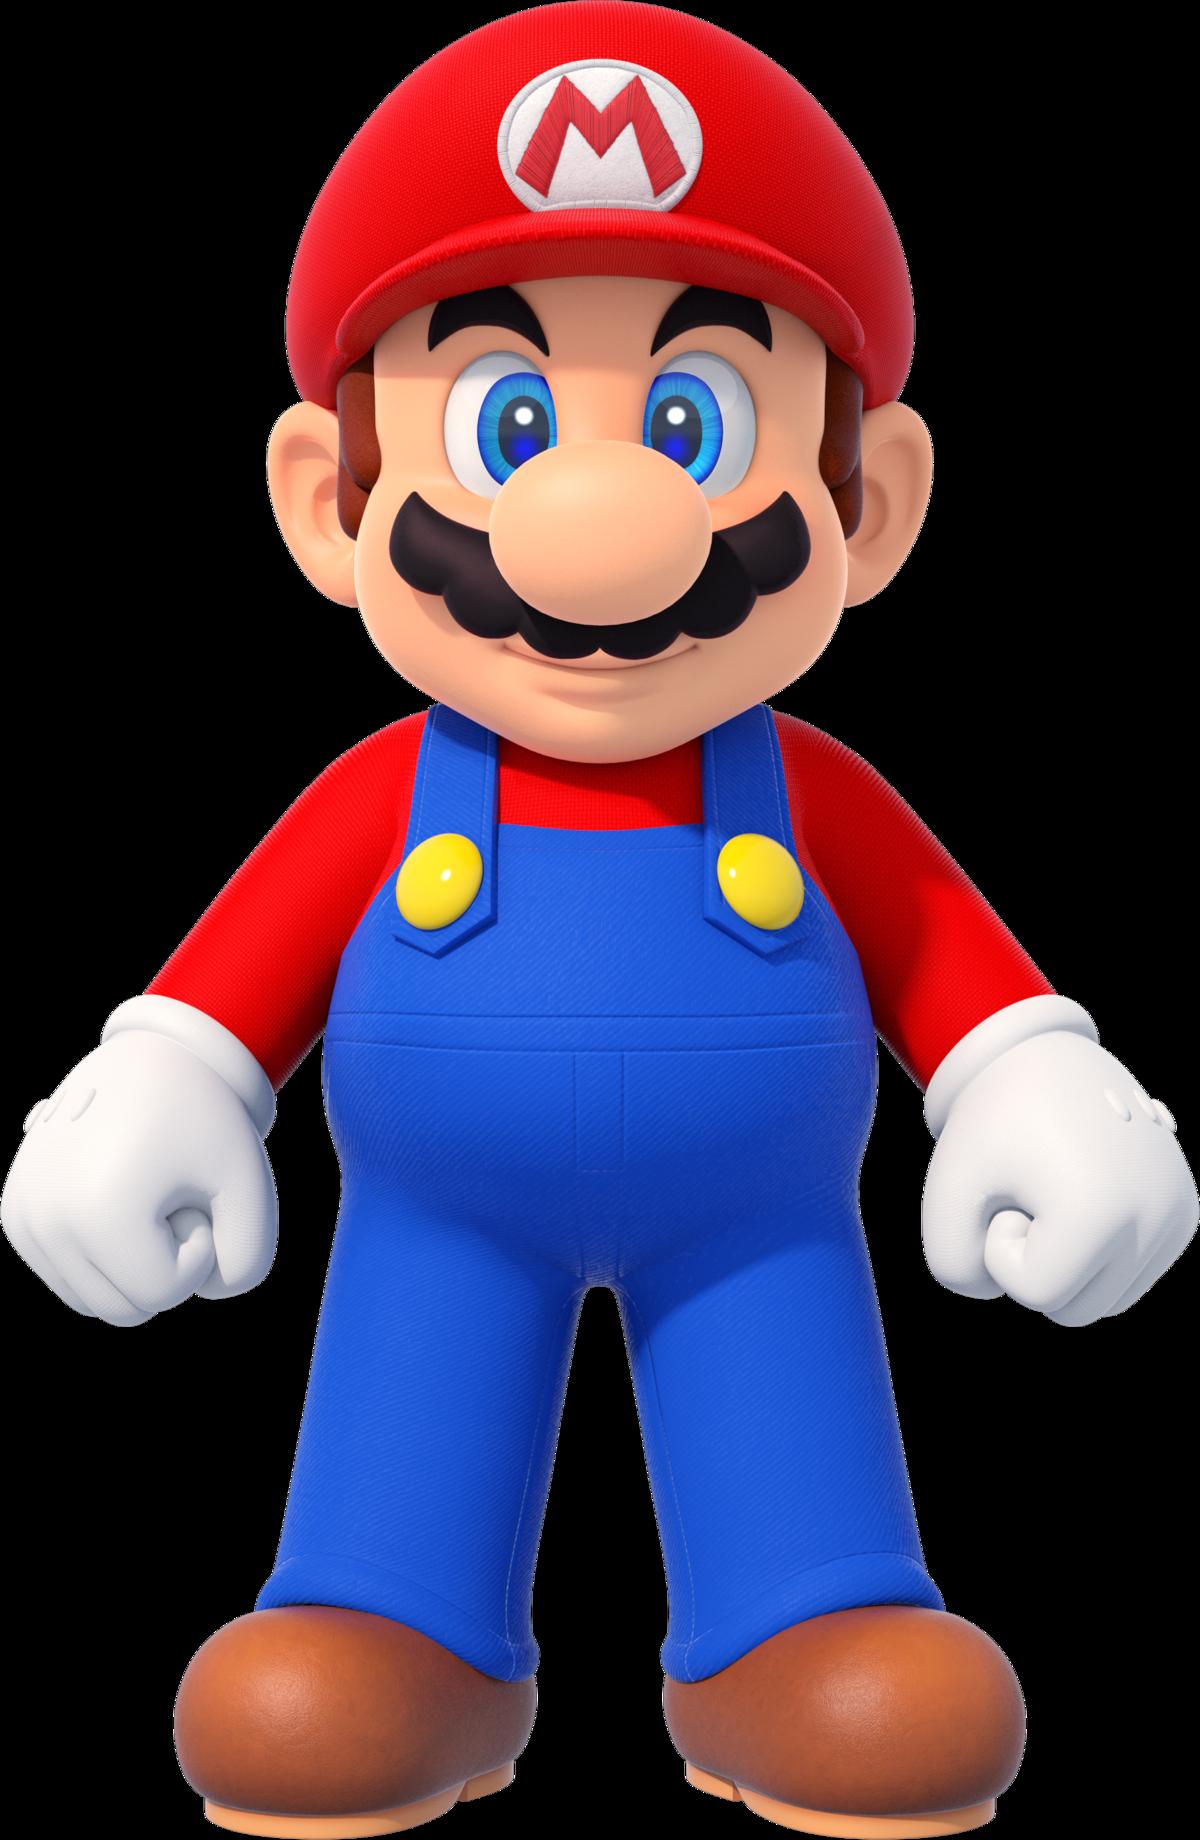 Mario Super Mario Wiki, l'enciclopedia italiana